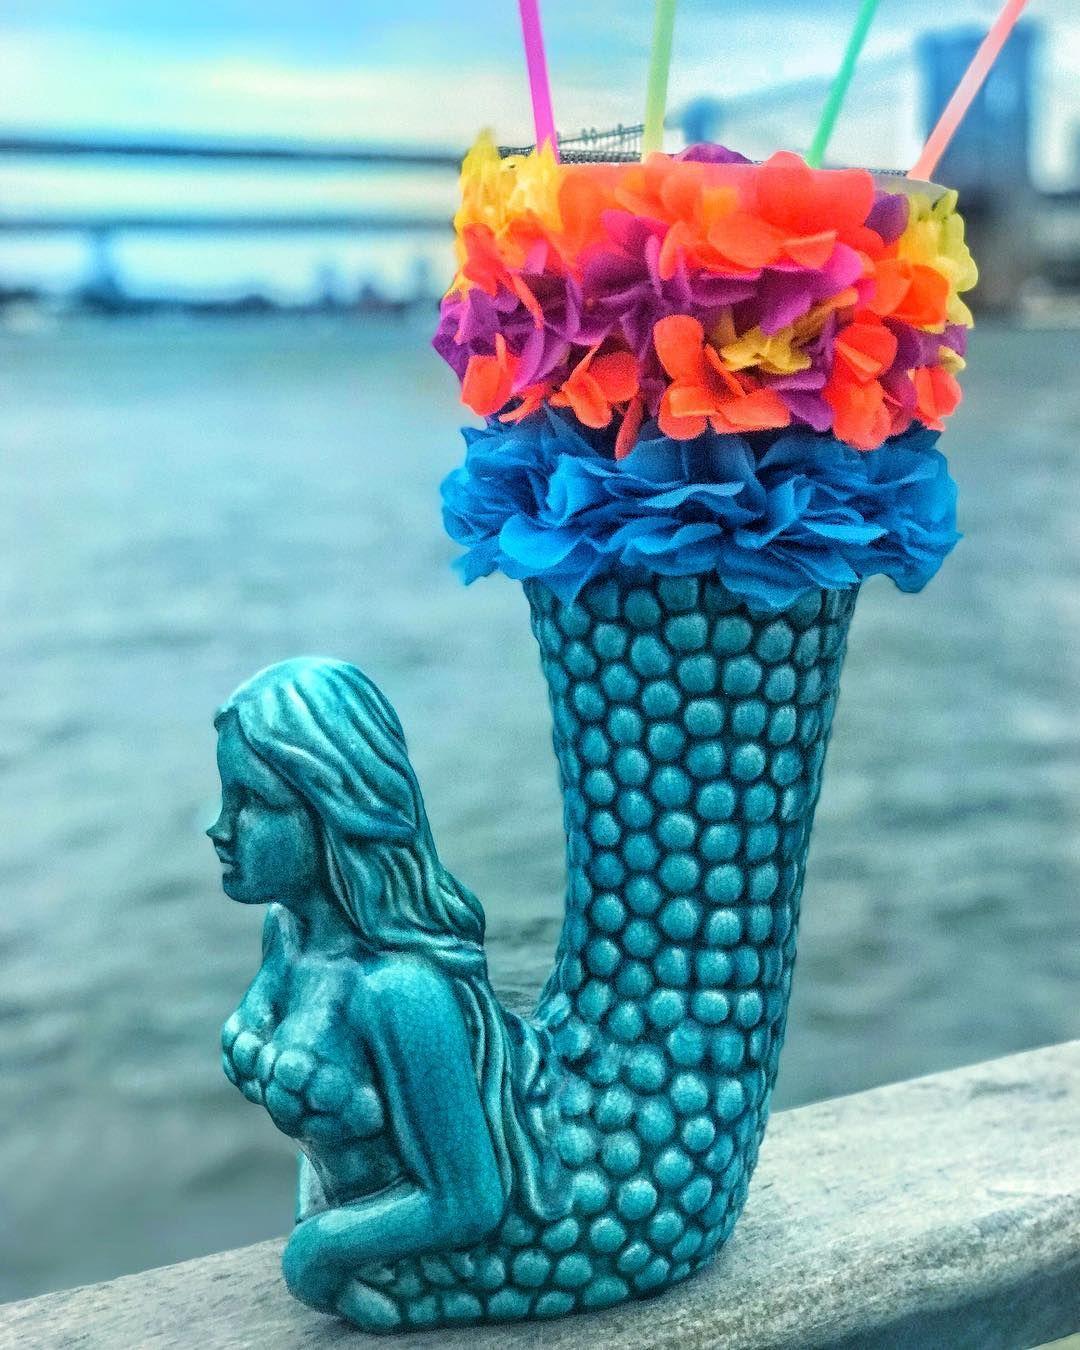 The Siren Giant Margarita Watermark Bar Https Www Facebook Com Insiderfood Videos 1743397259298077 78 South St New York Ny 1 Margarita Videos Sirens